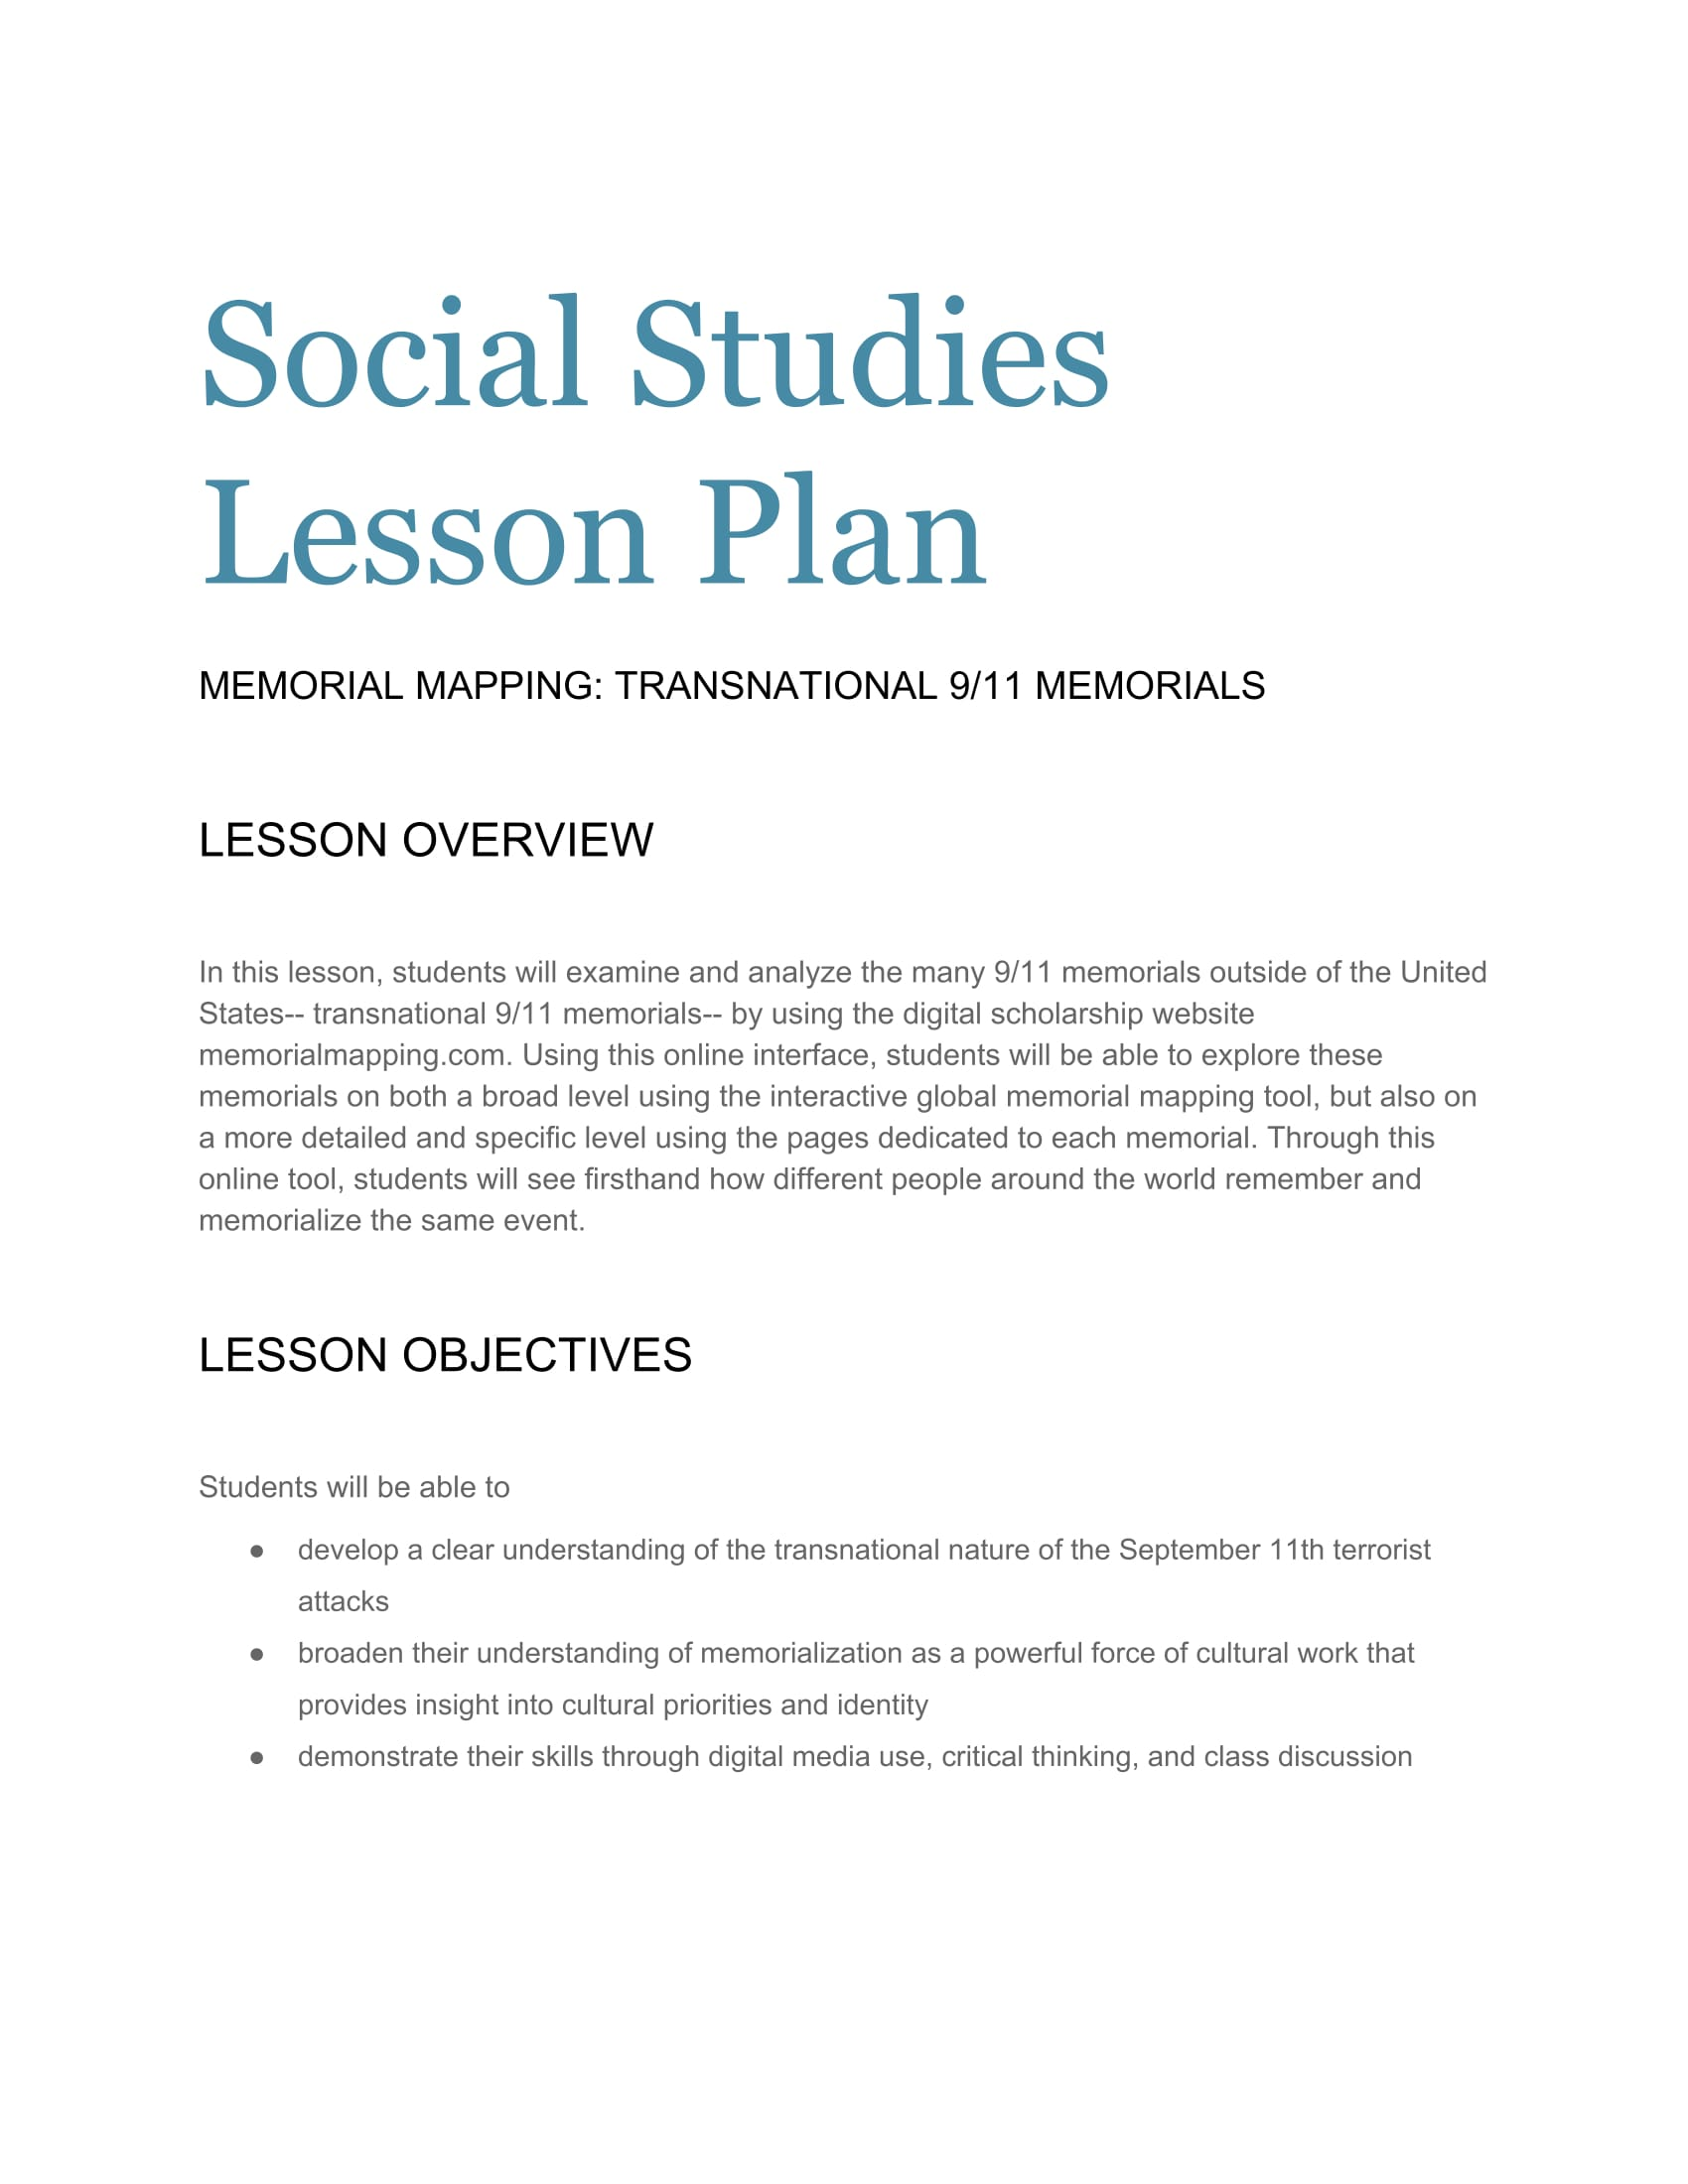 Social Studies Lesson Plan Final-1.jpg